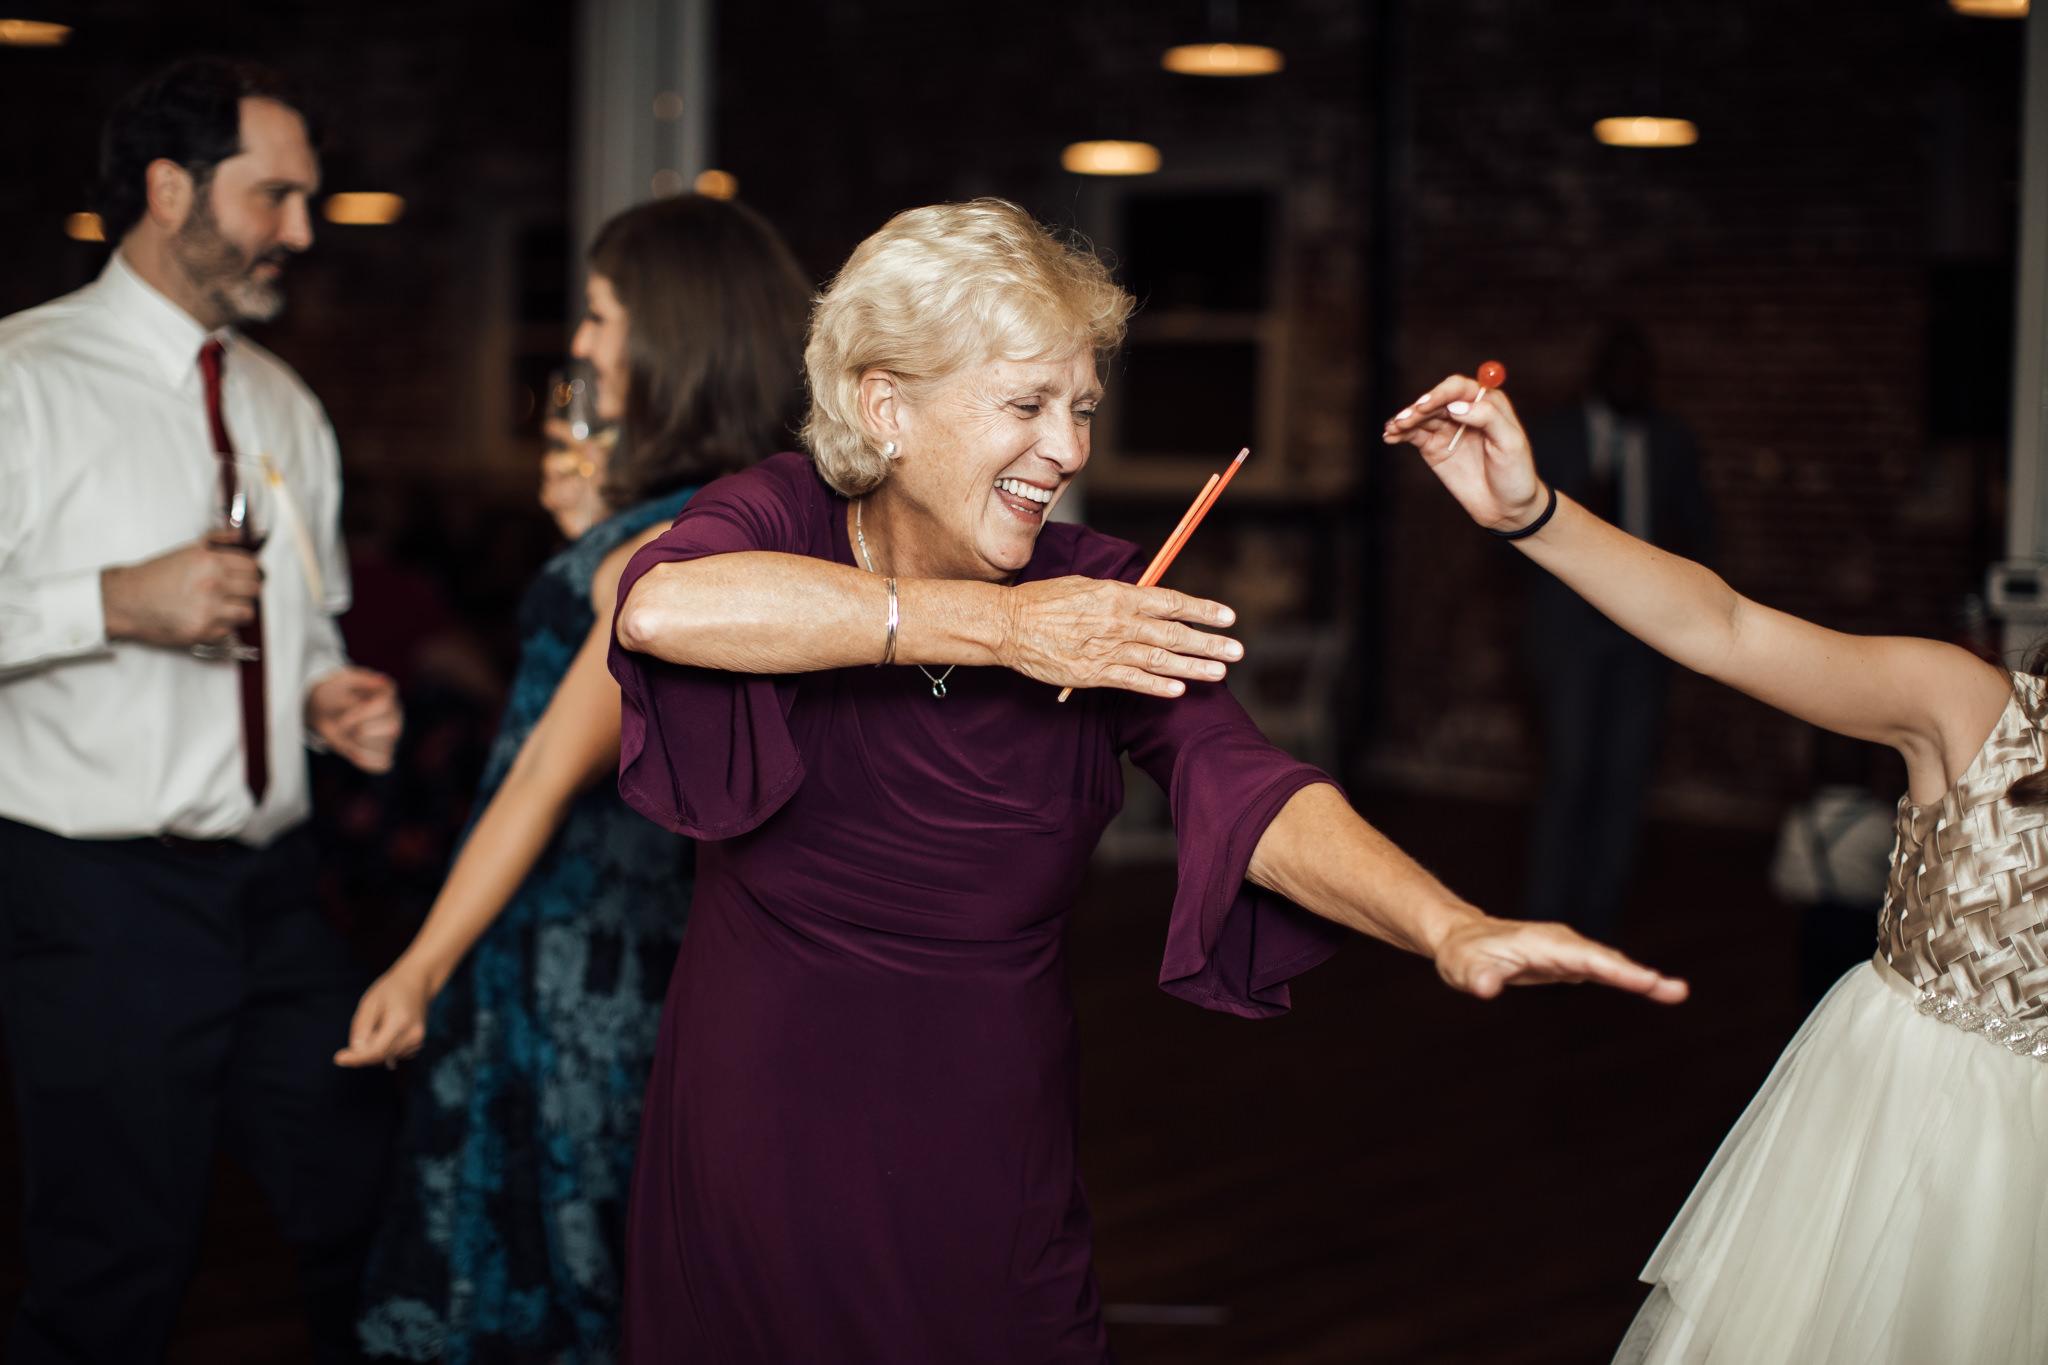 fall-engagement-photoshoot-cassie-cook-photography-memphis-wedding-photographer-27.jpg